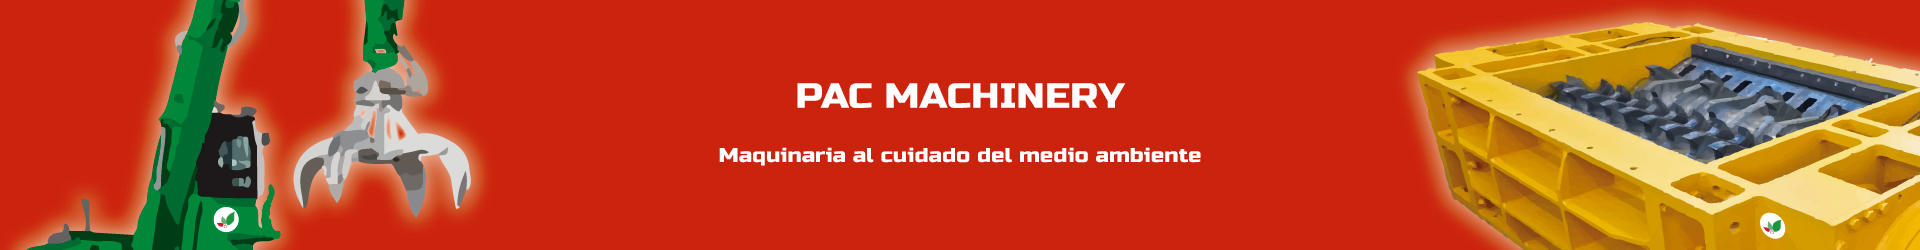 PacMachinery - venta de maquinaria para reciclaje